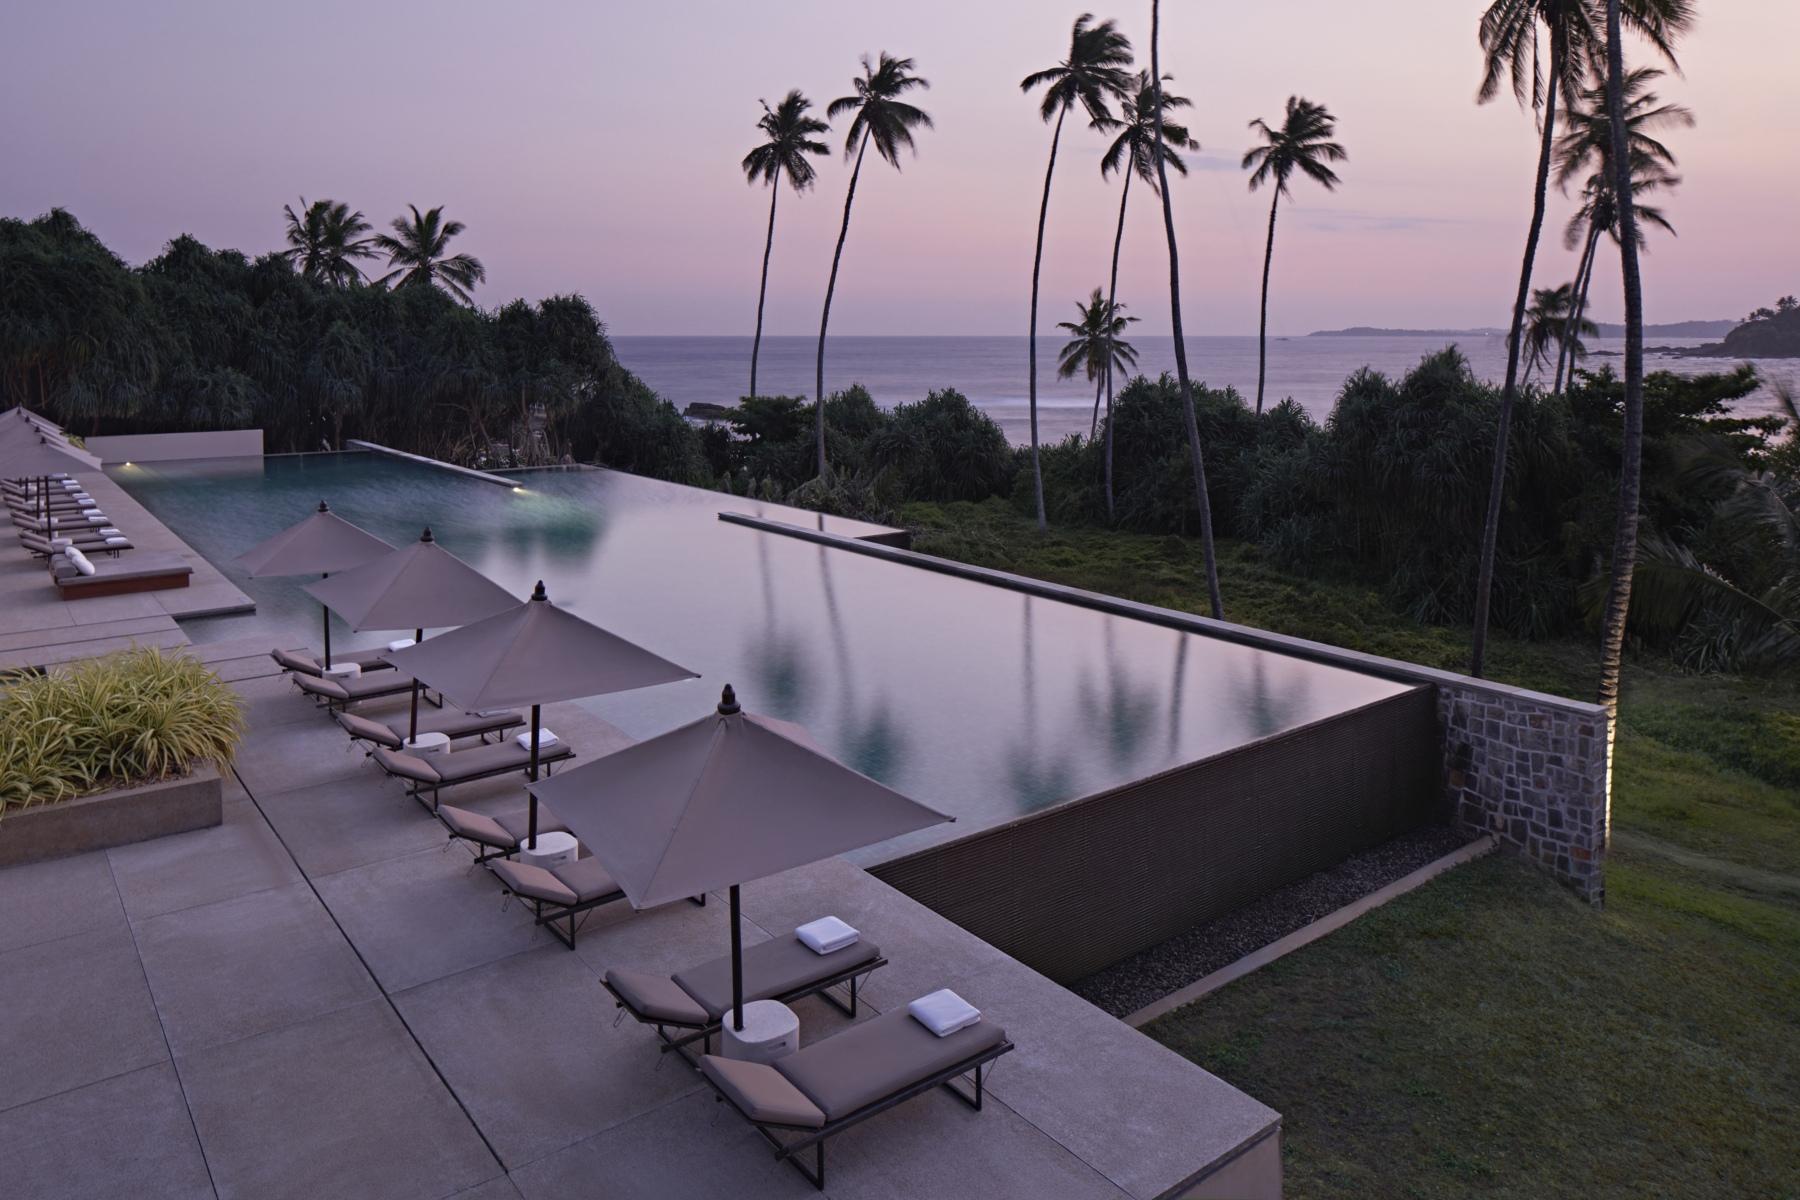 Amanwella, Sri Lanka - Pool, ocean view, sunset 3.tif